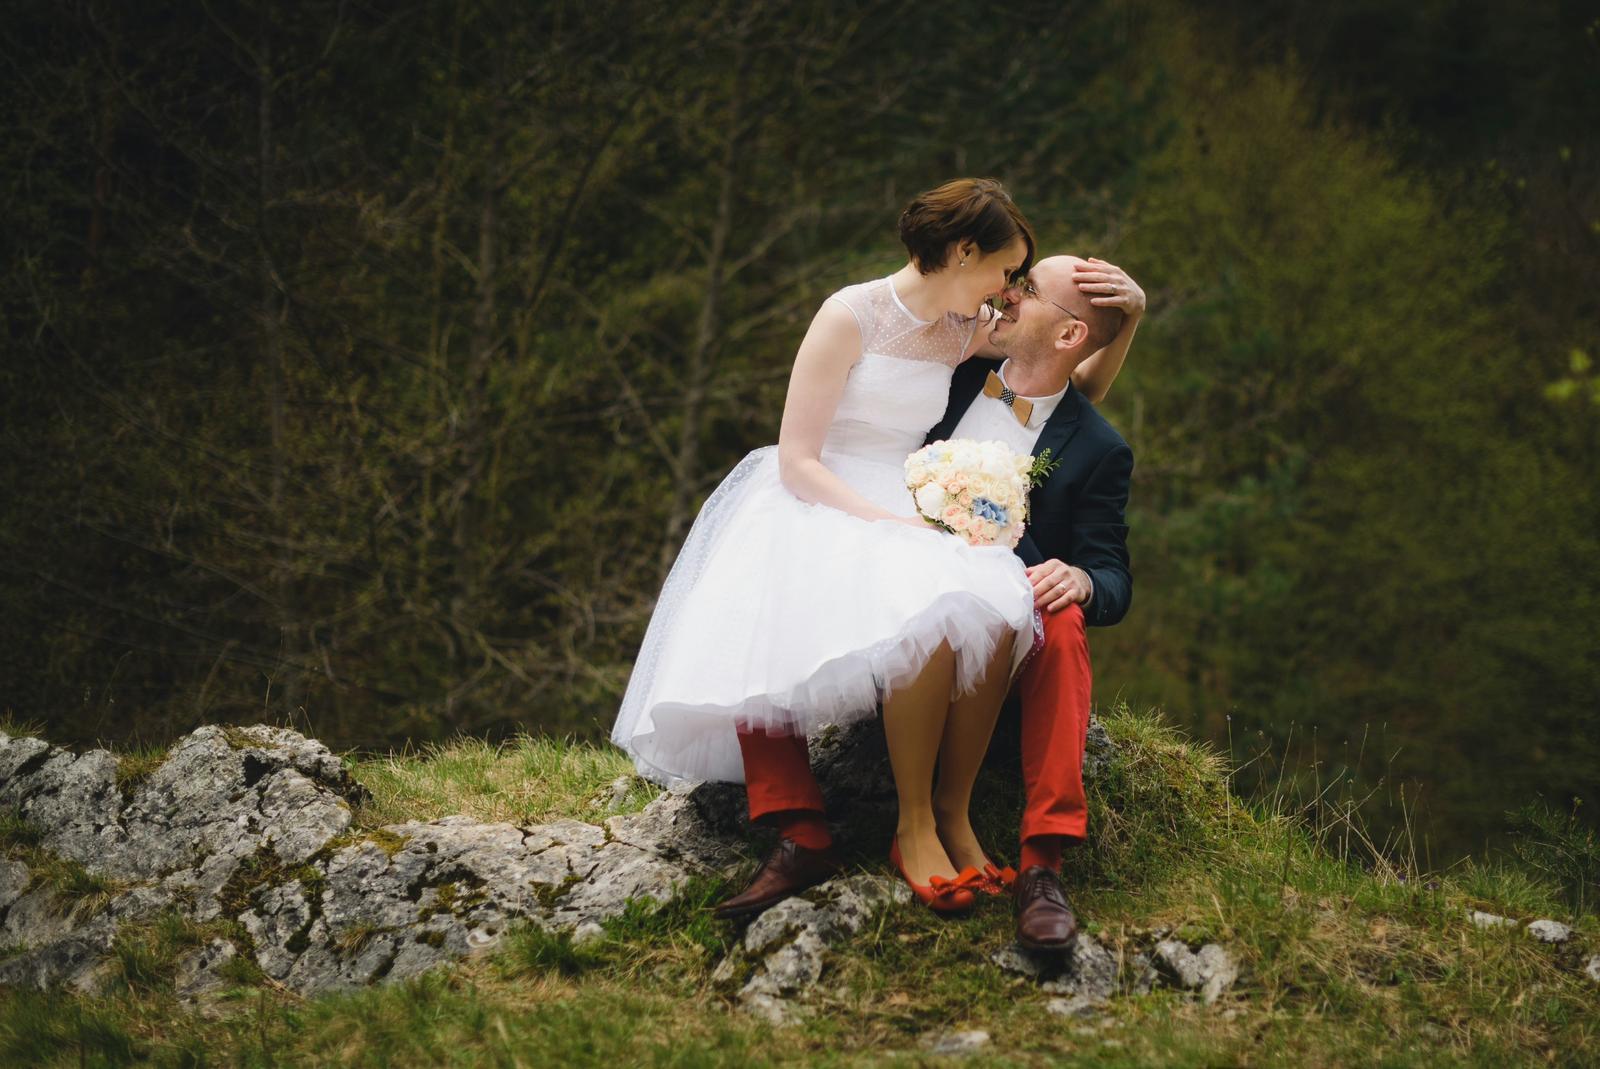 peter_a_lucia - Krátke svadobné šaty s bodkovaným tylom